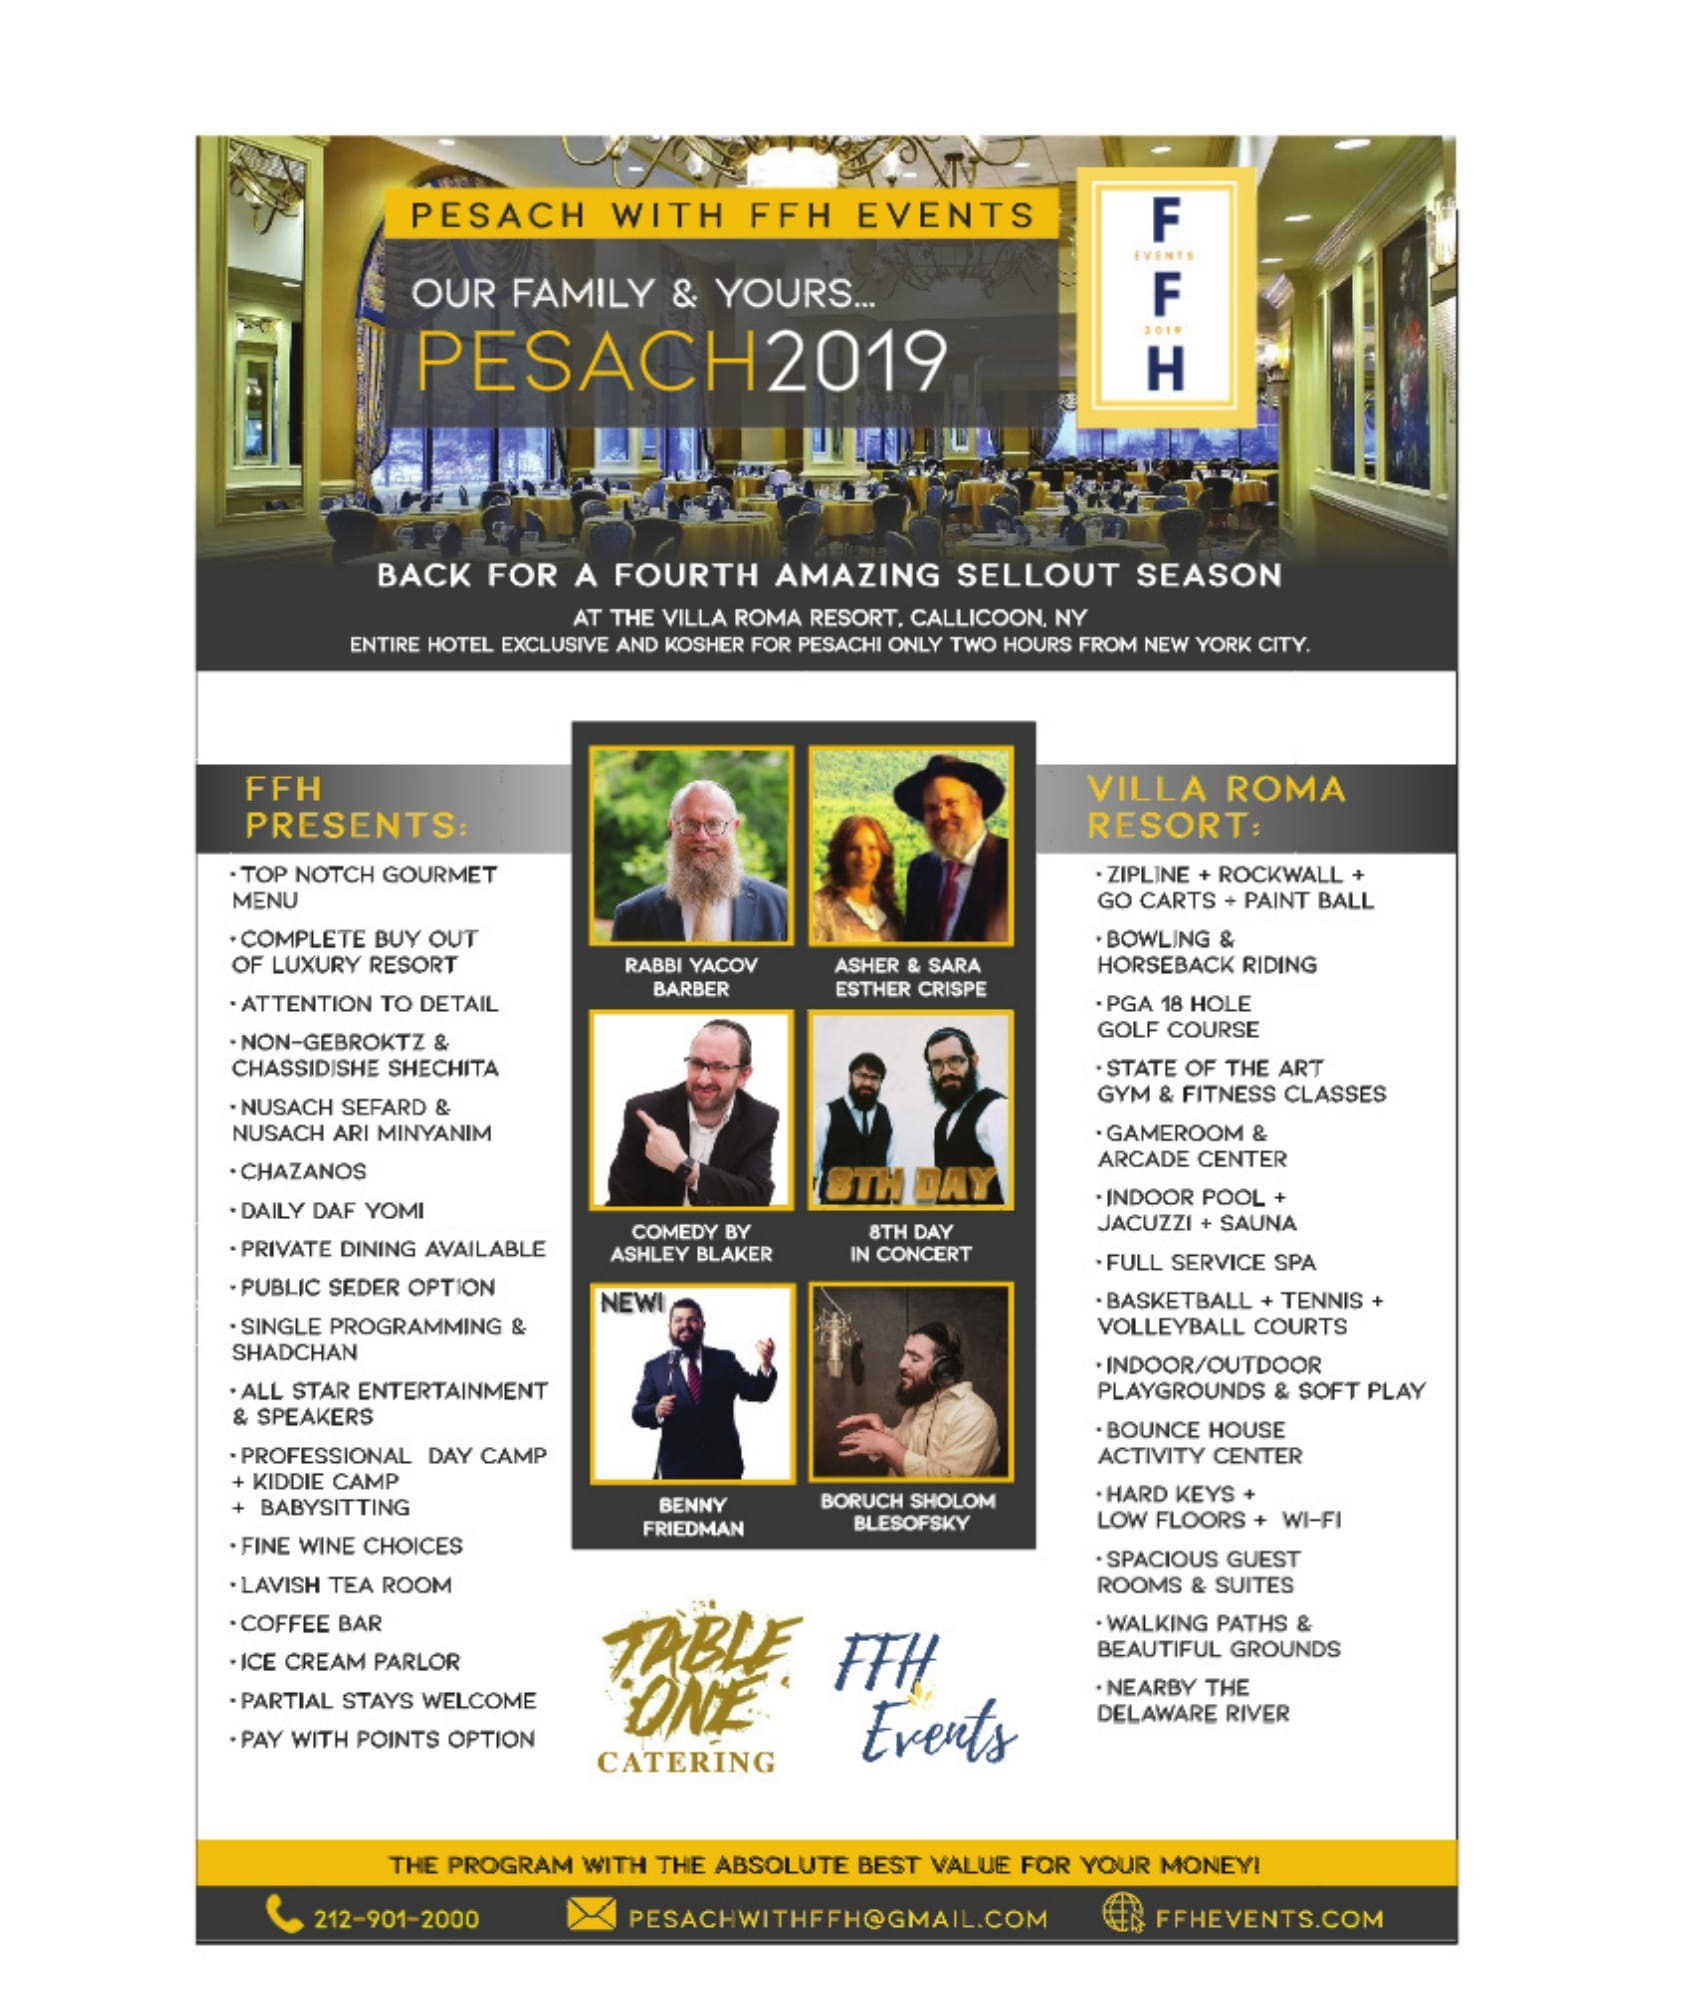 Pesach with FFH Events - KosherGuru - Bringing Anything and